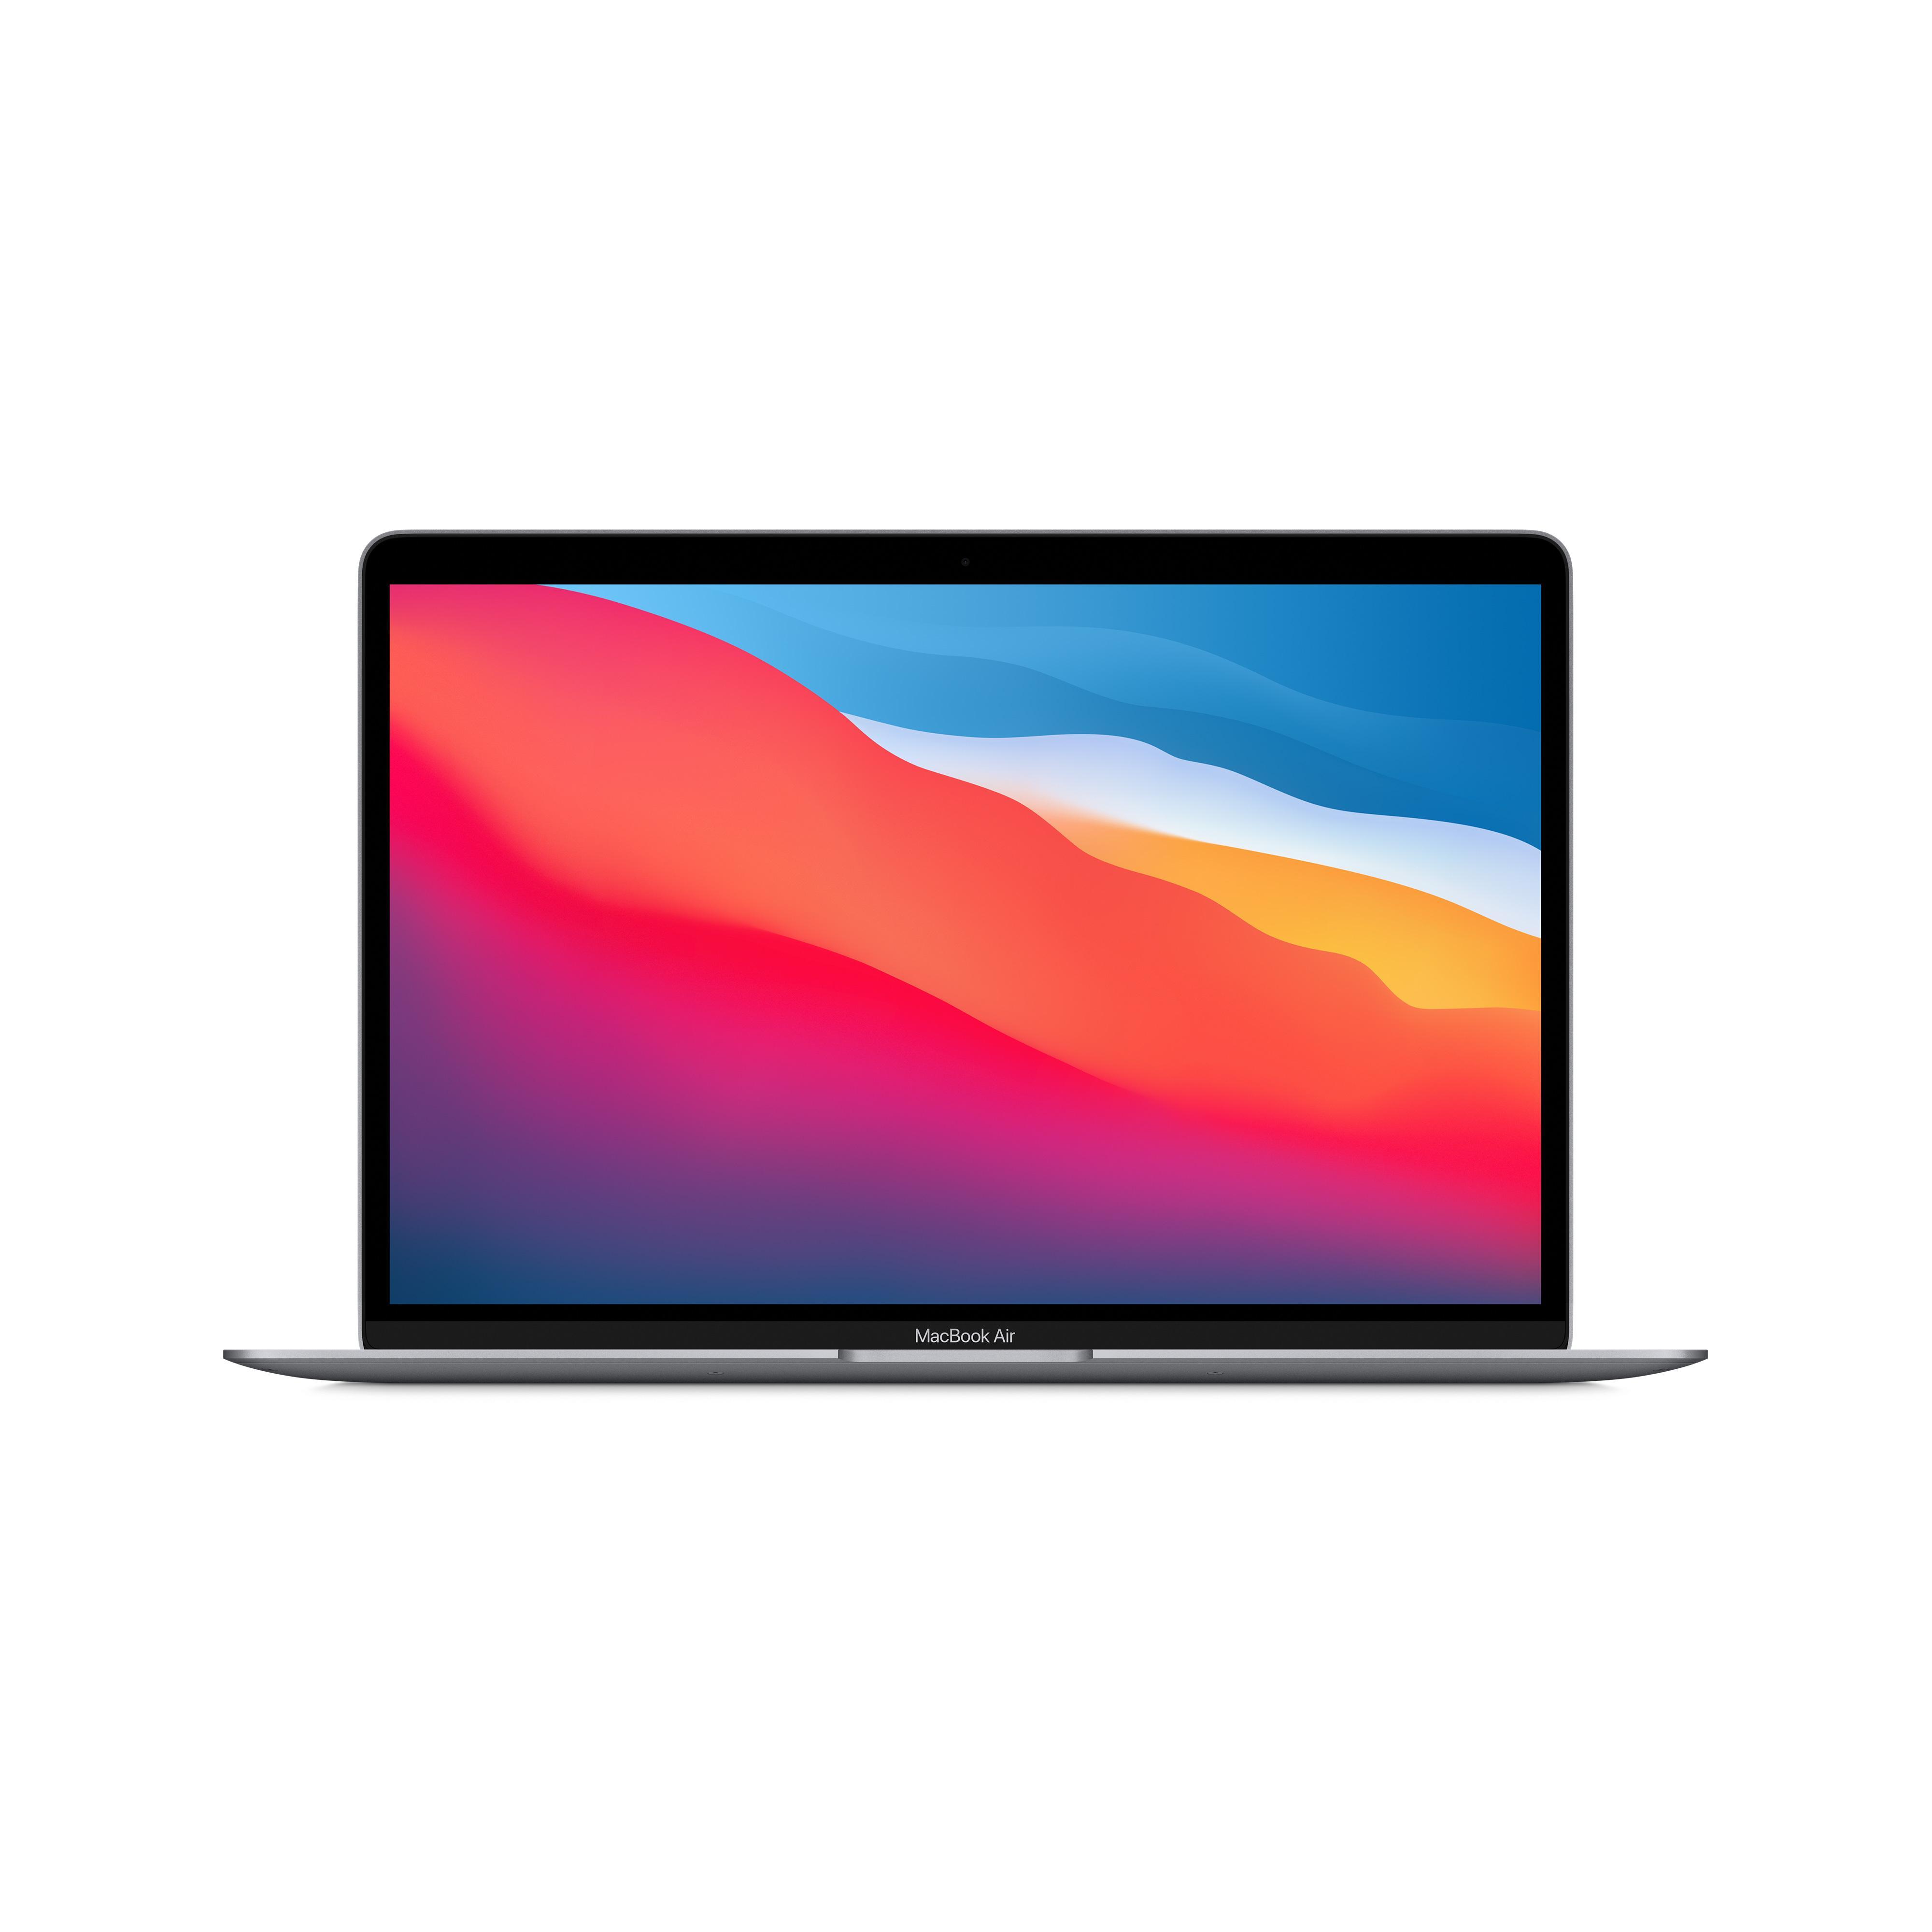 "Apple MacBook Air 13"" (Chip M1 con GPU 8-core, 512GB SSD, 8GB RAM) Grigio Siderale (2020)"